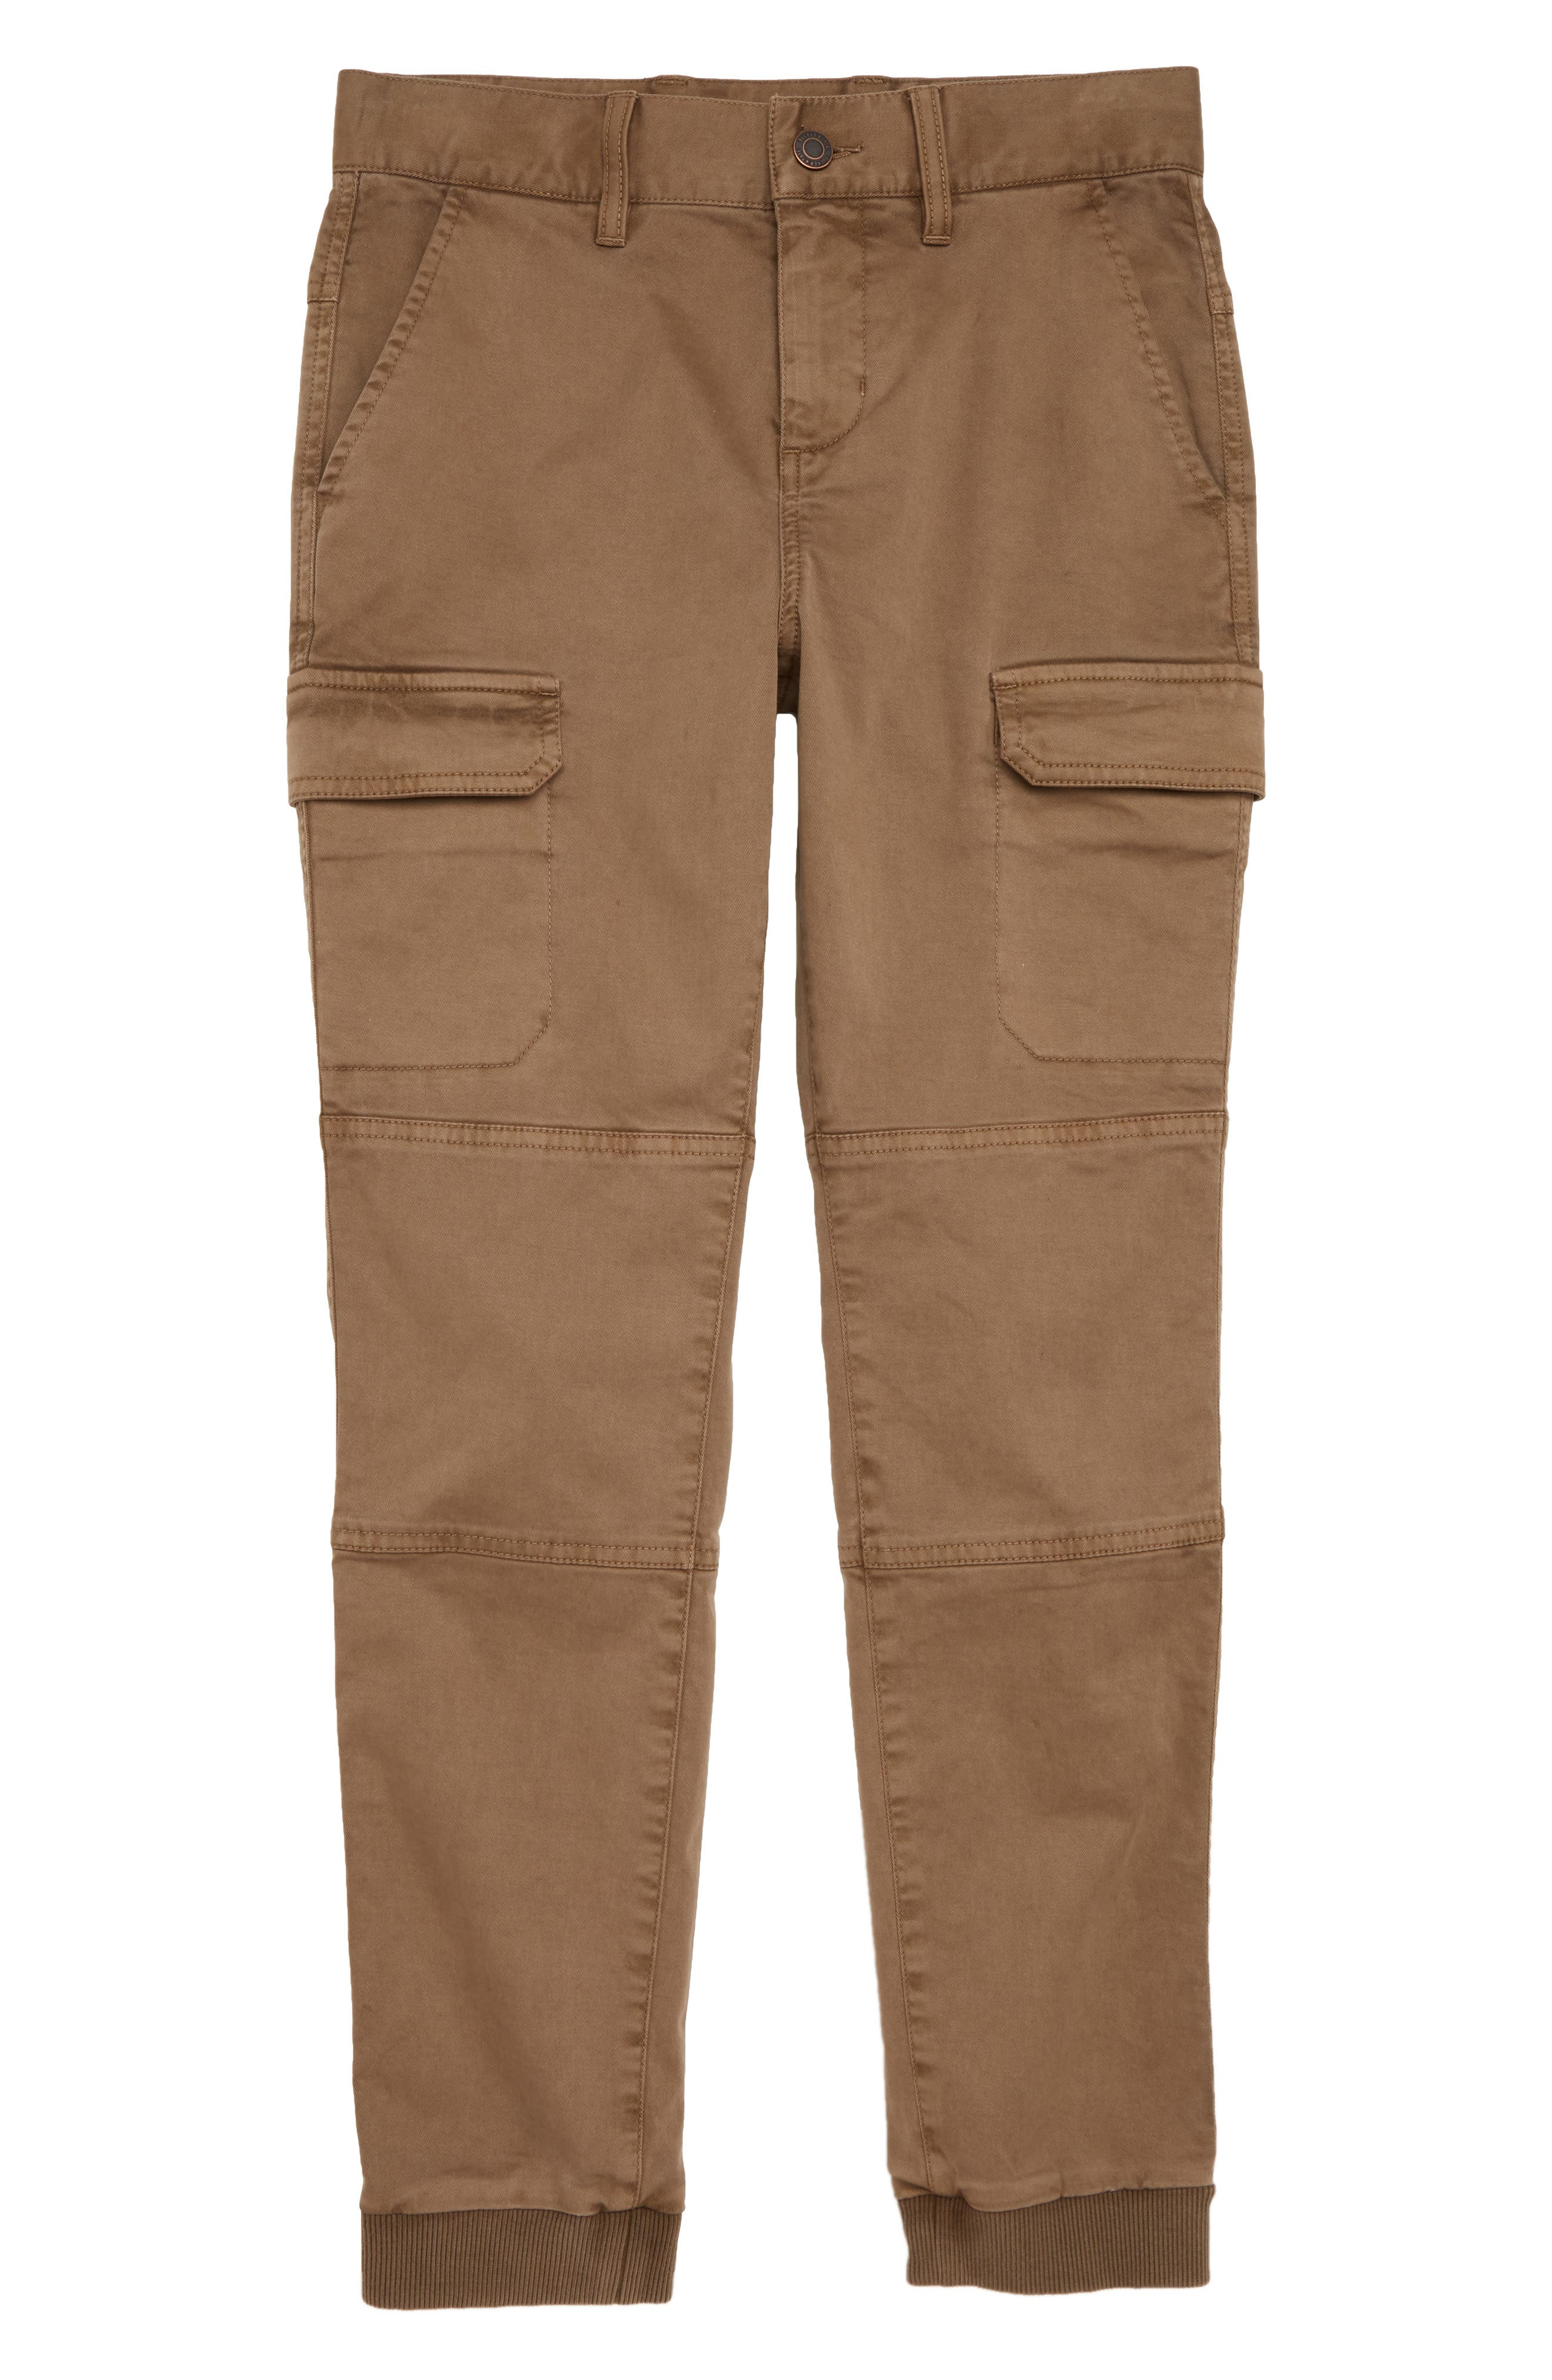 Cargo Jogger Pants,                             Main thumbnail 1, color,                             BROWN CUB